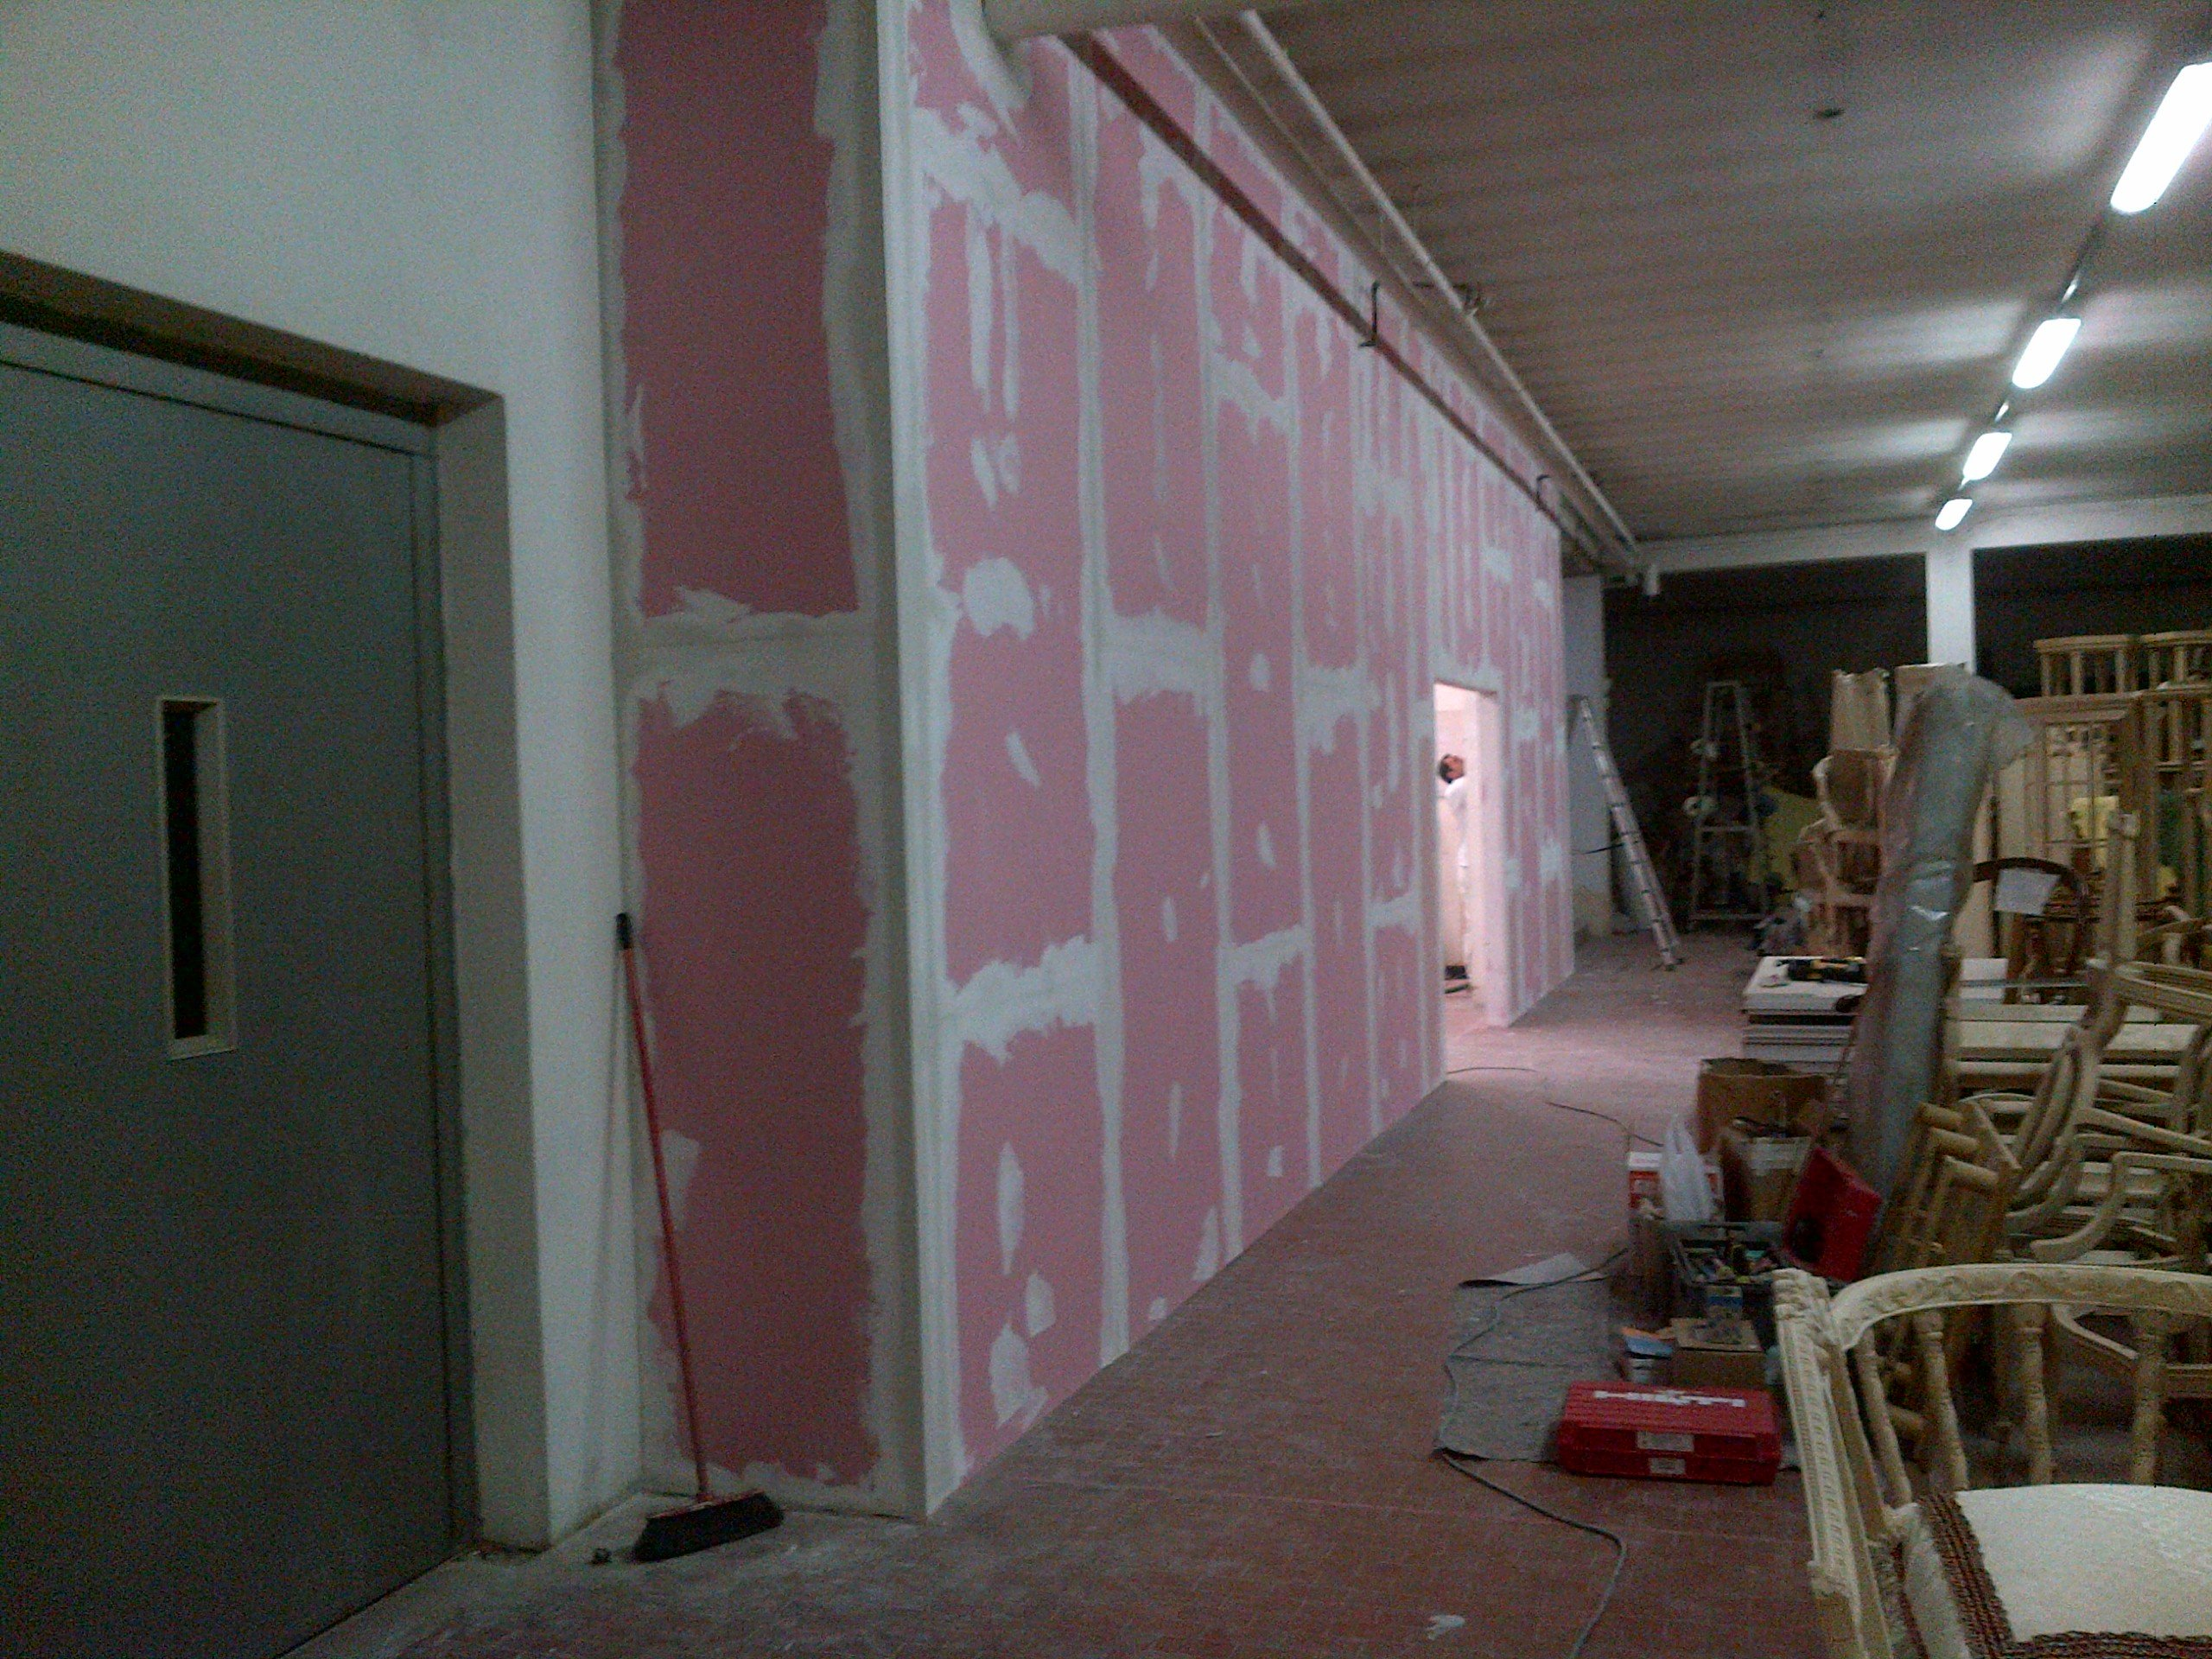 parete in cartongesso bianca e rosa da ridefinire